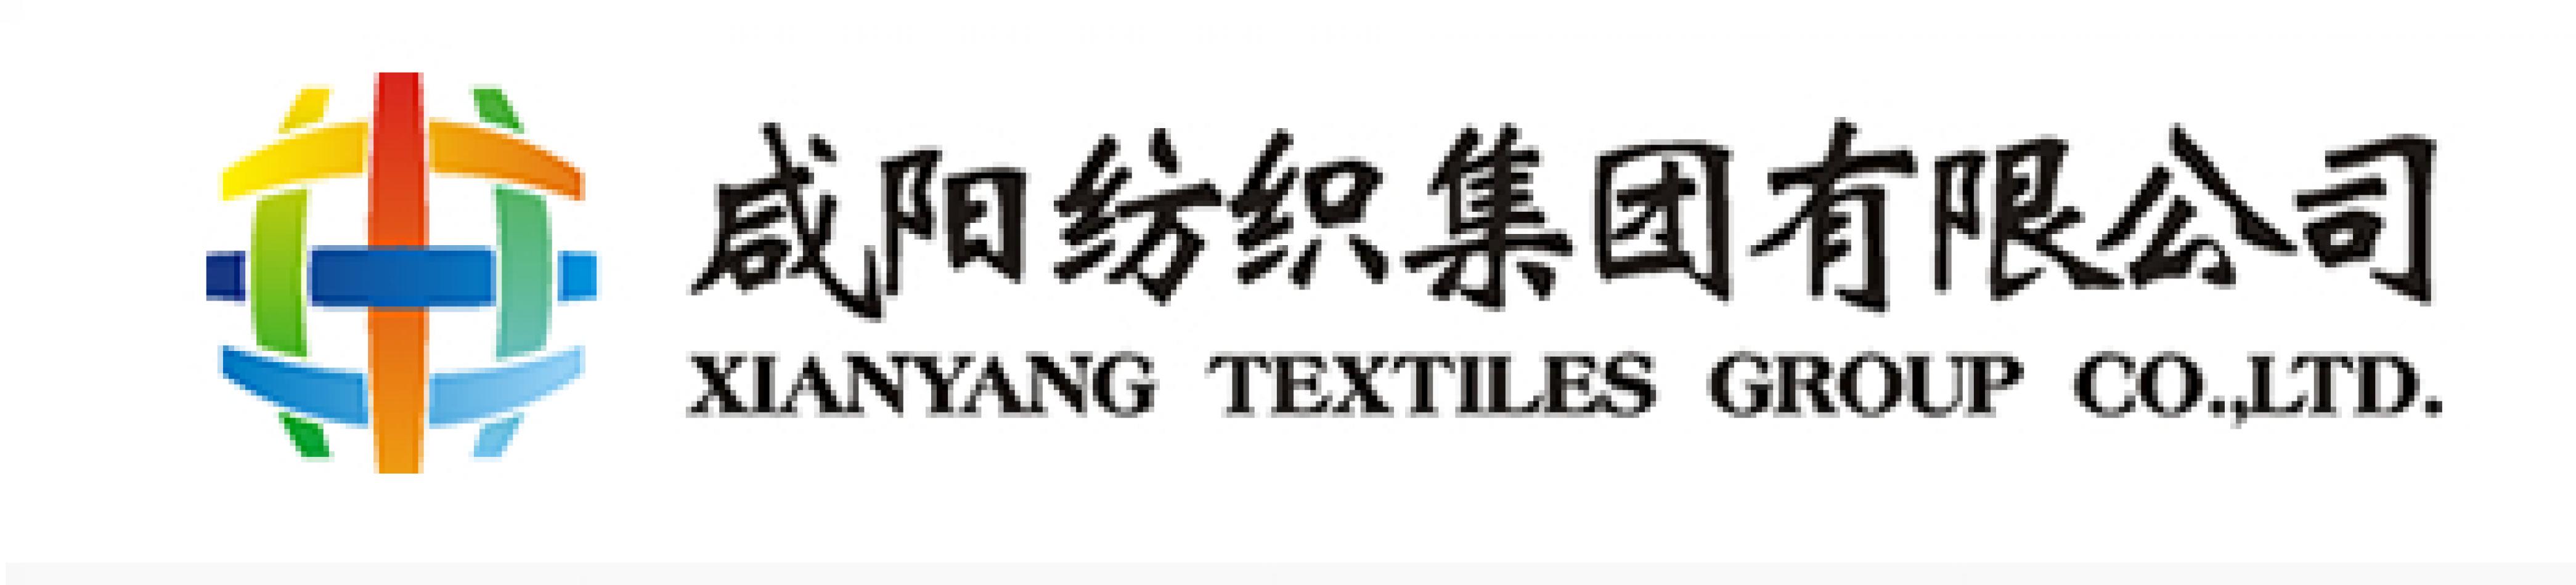 XIANYANG TEXTILES GROUP CO LTD